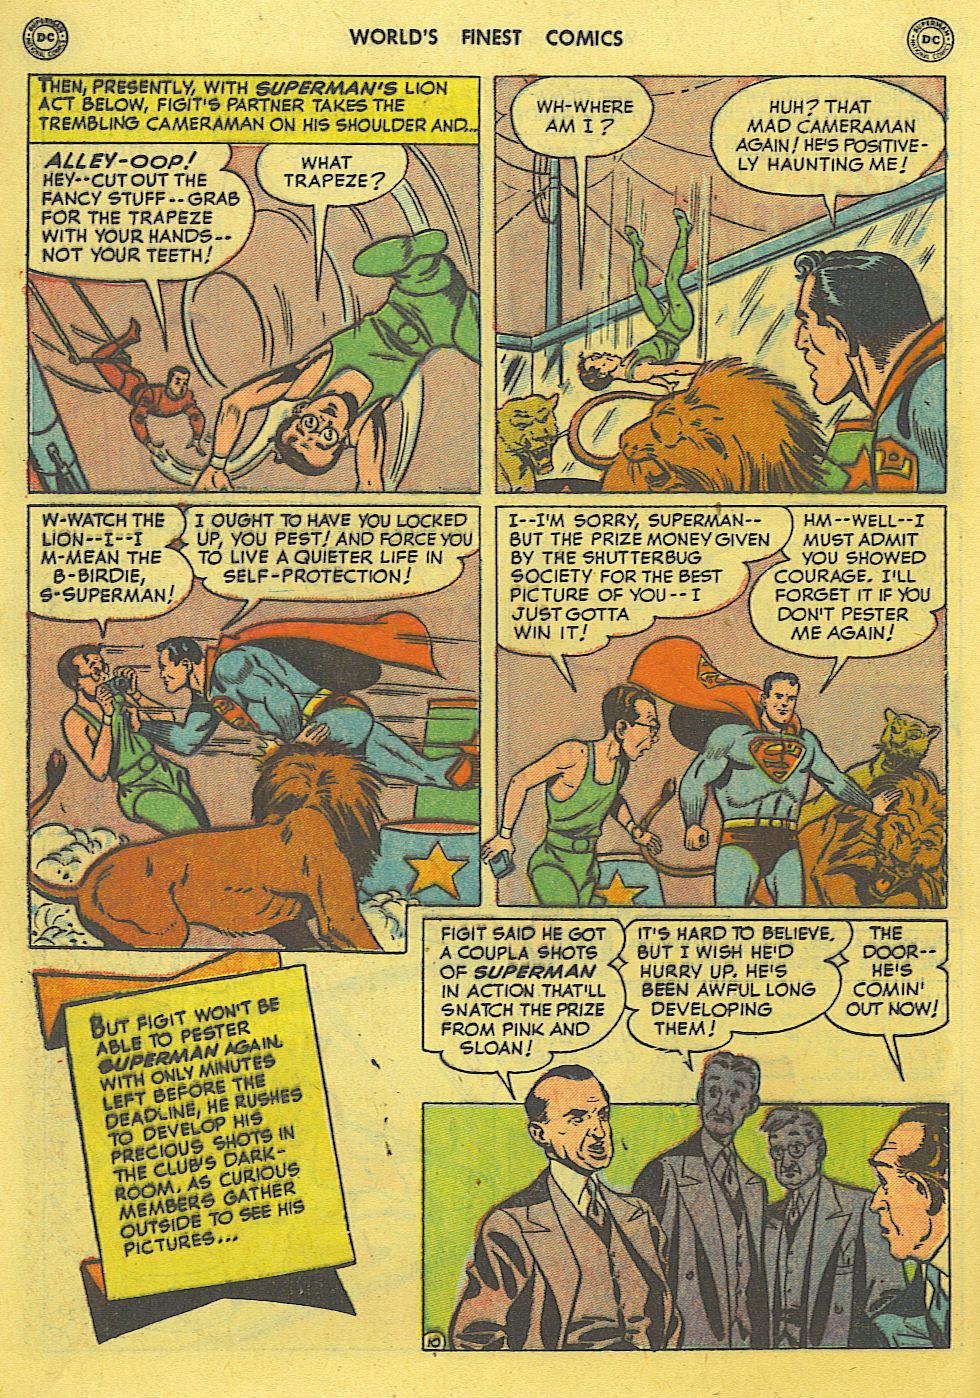 Read online World's Finest Comics comic -  Issue #49 - 13